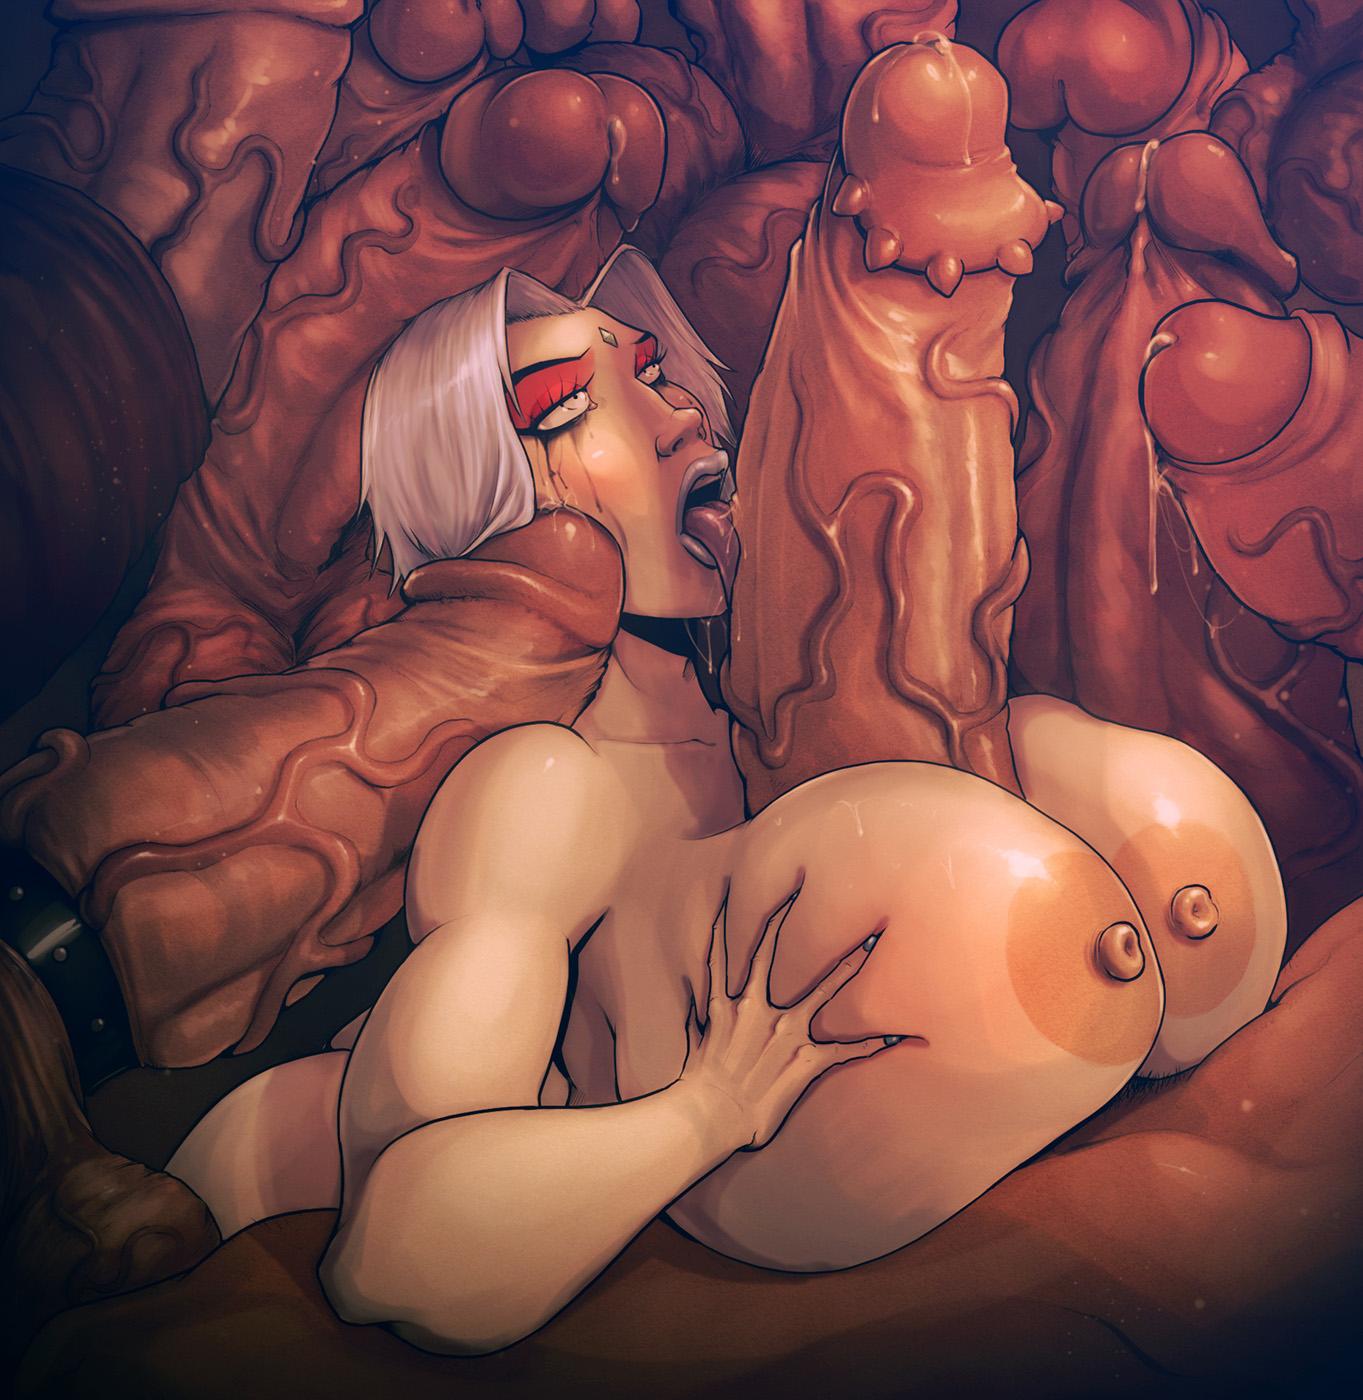 anime Big sex dick